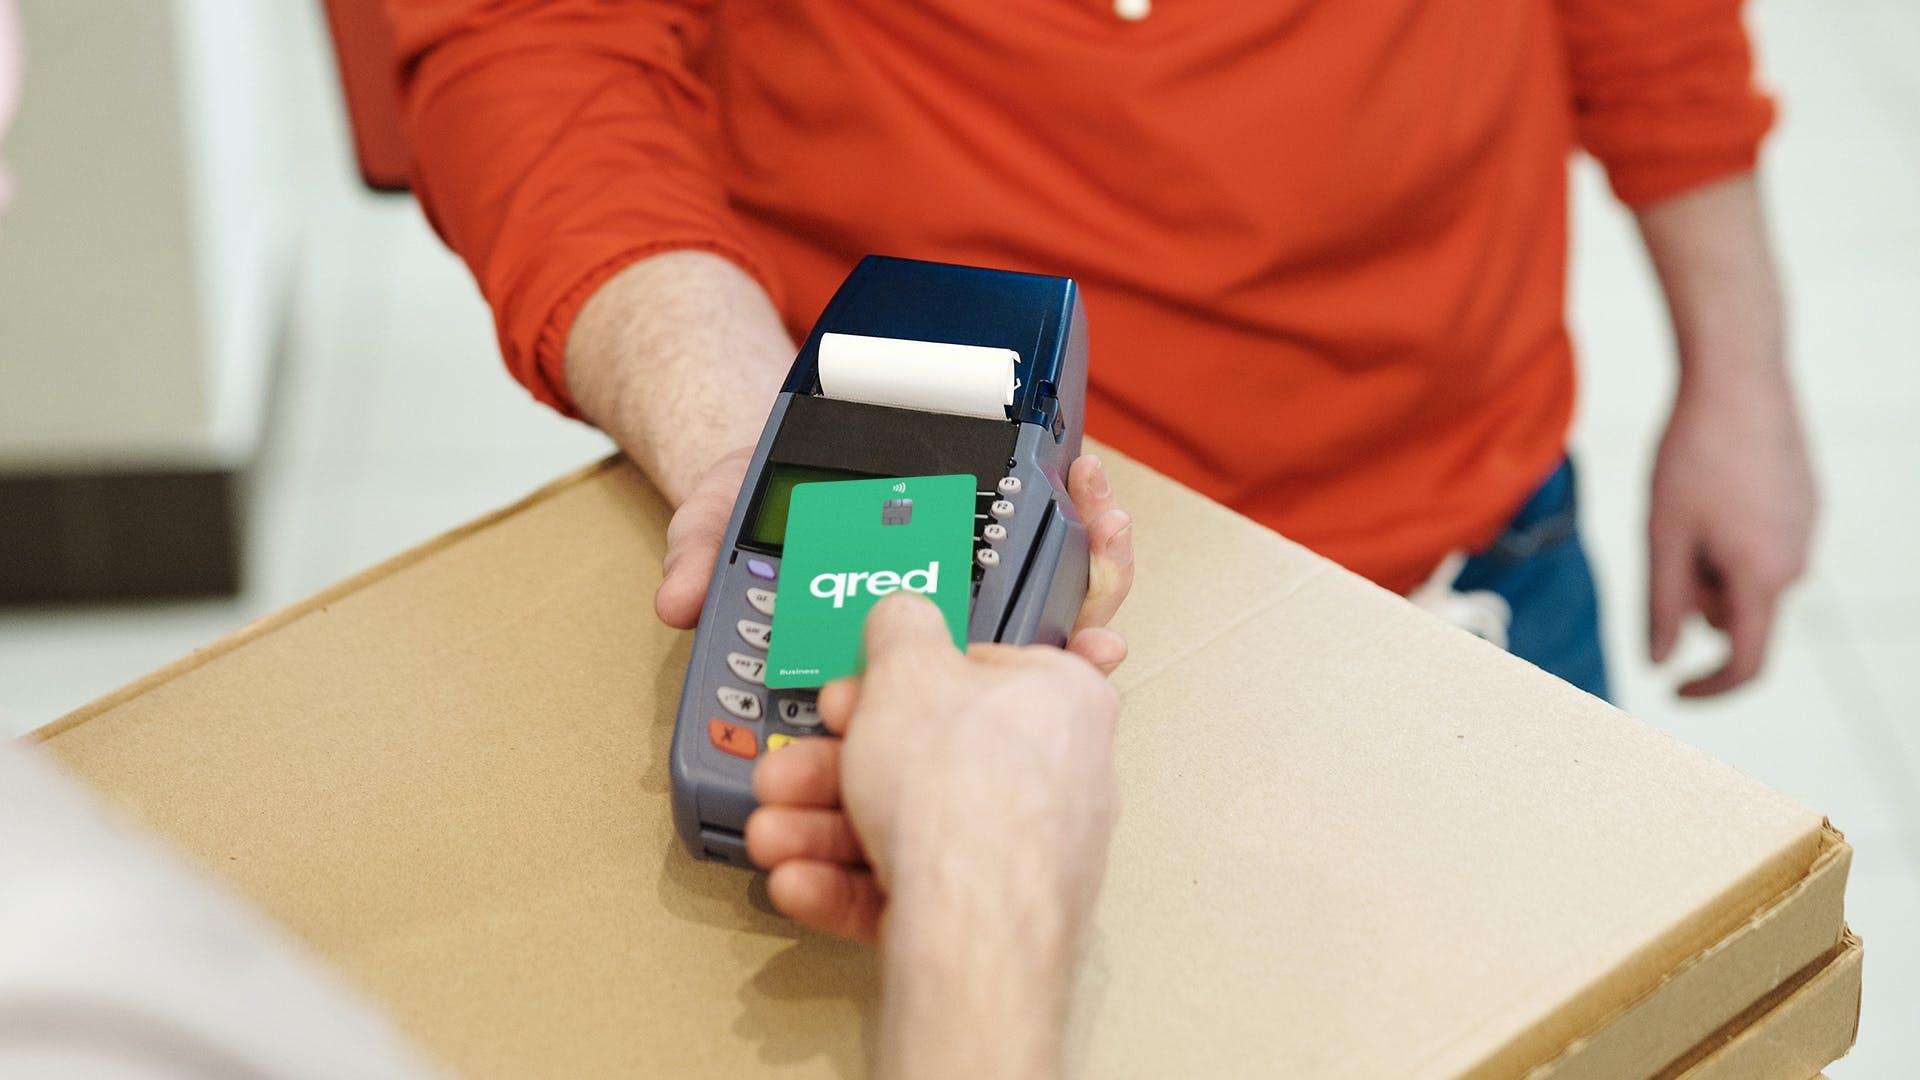 Qred lanserar kreditkort